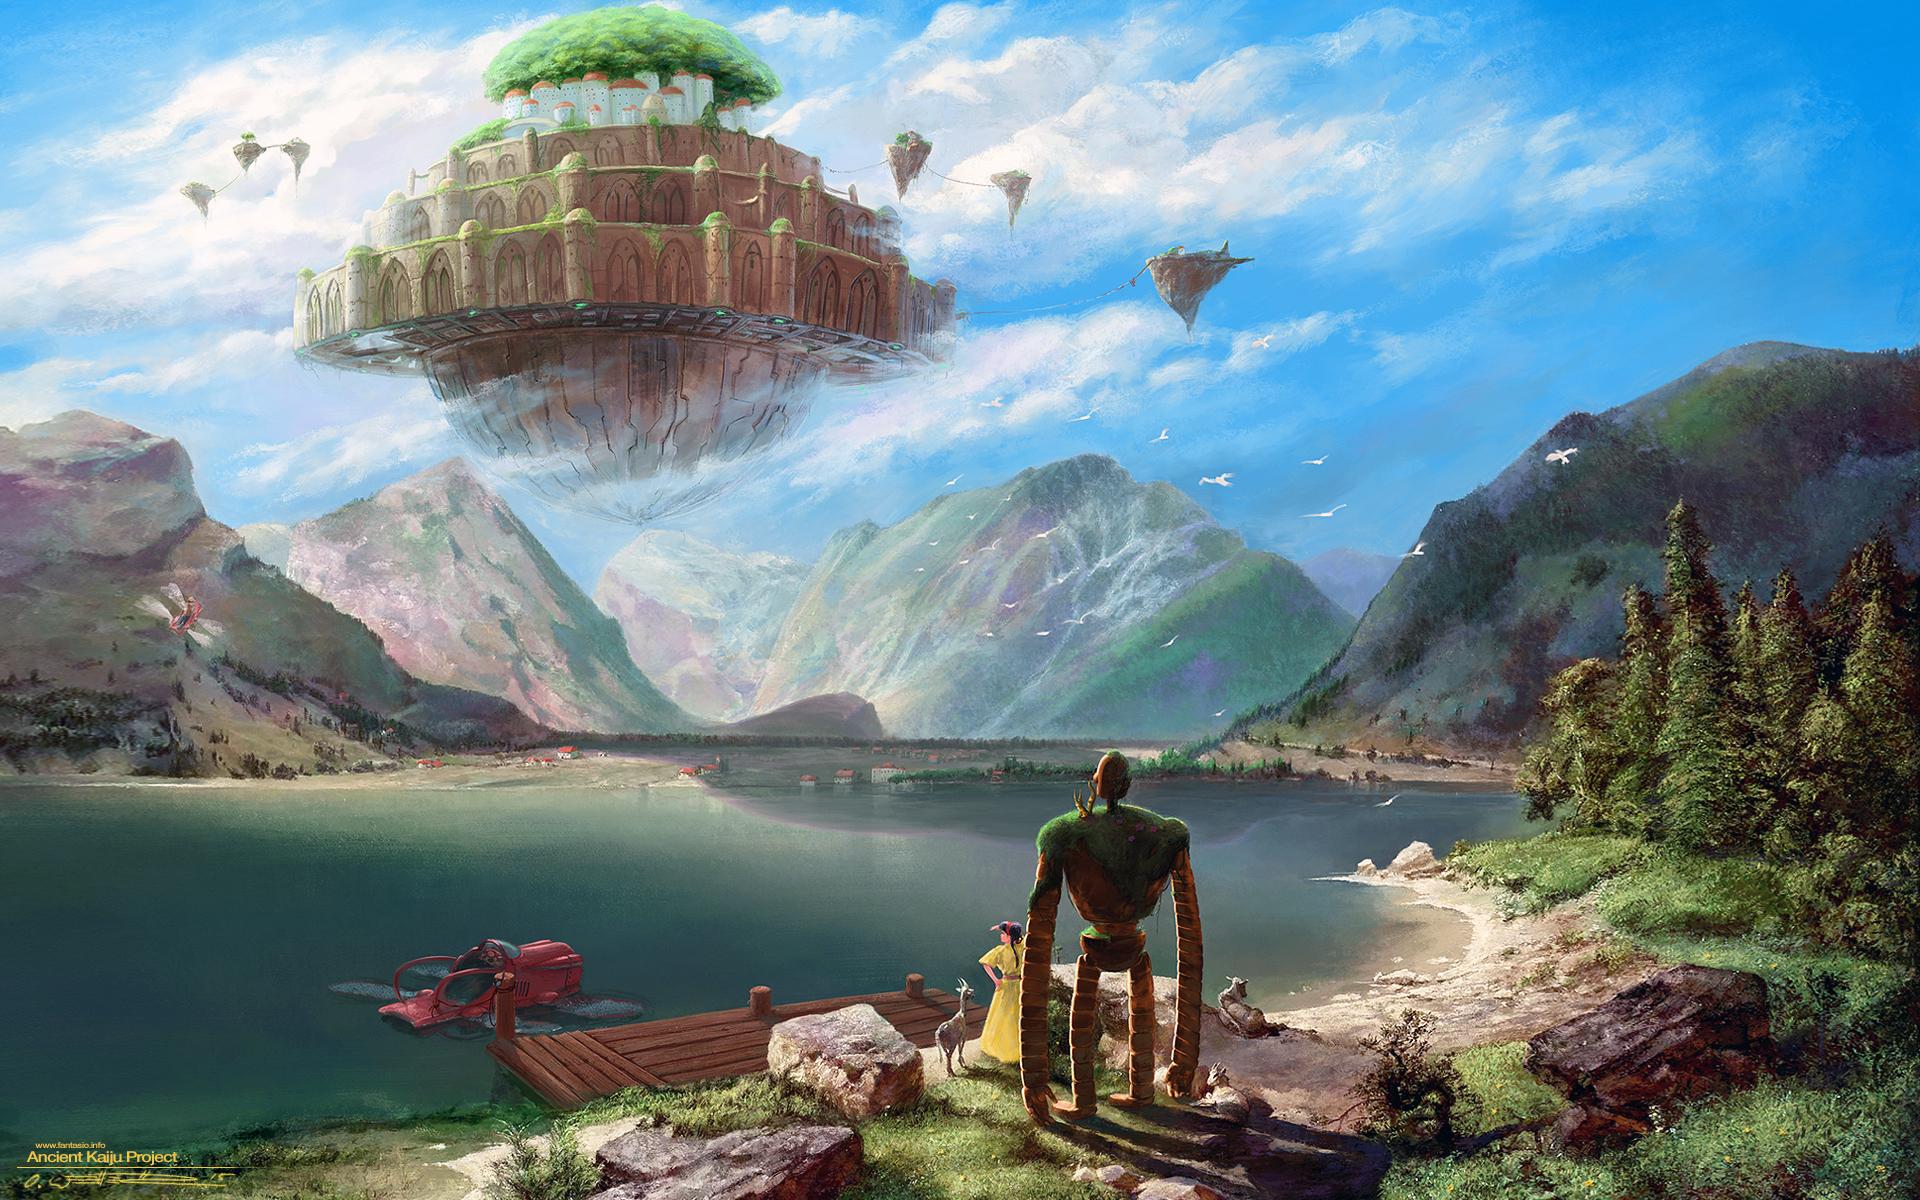 castles in the sky tab pdf